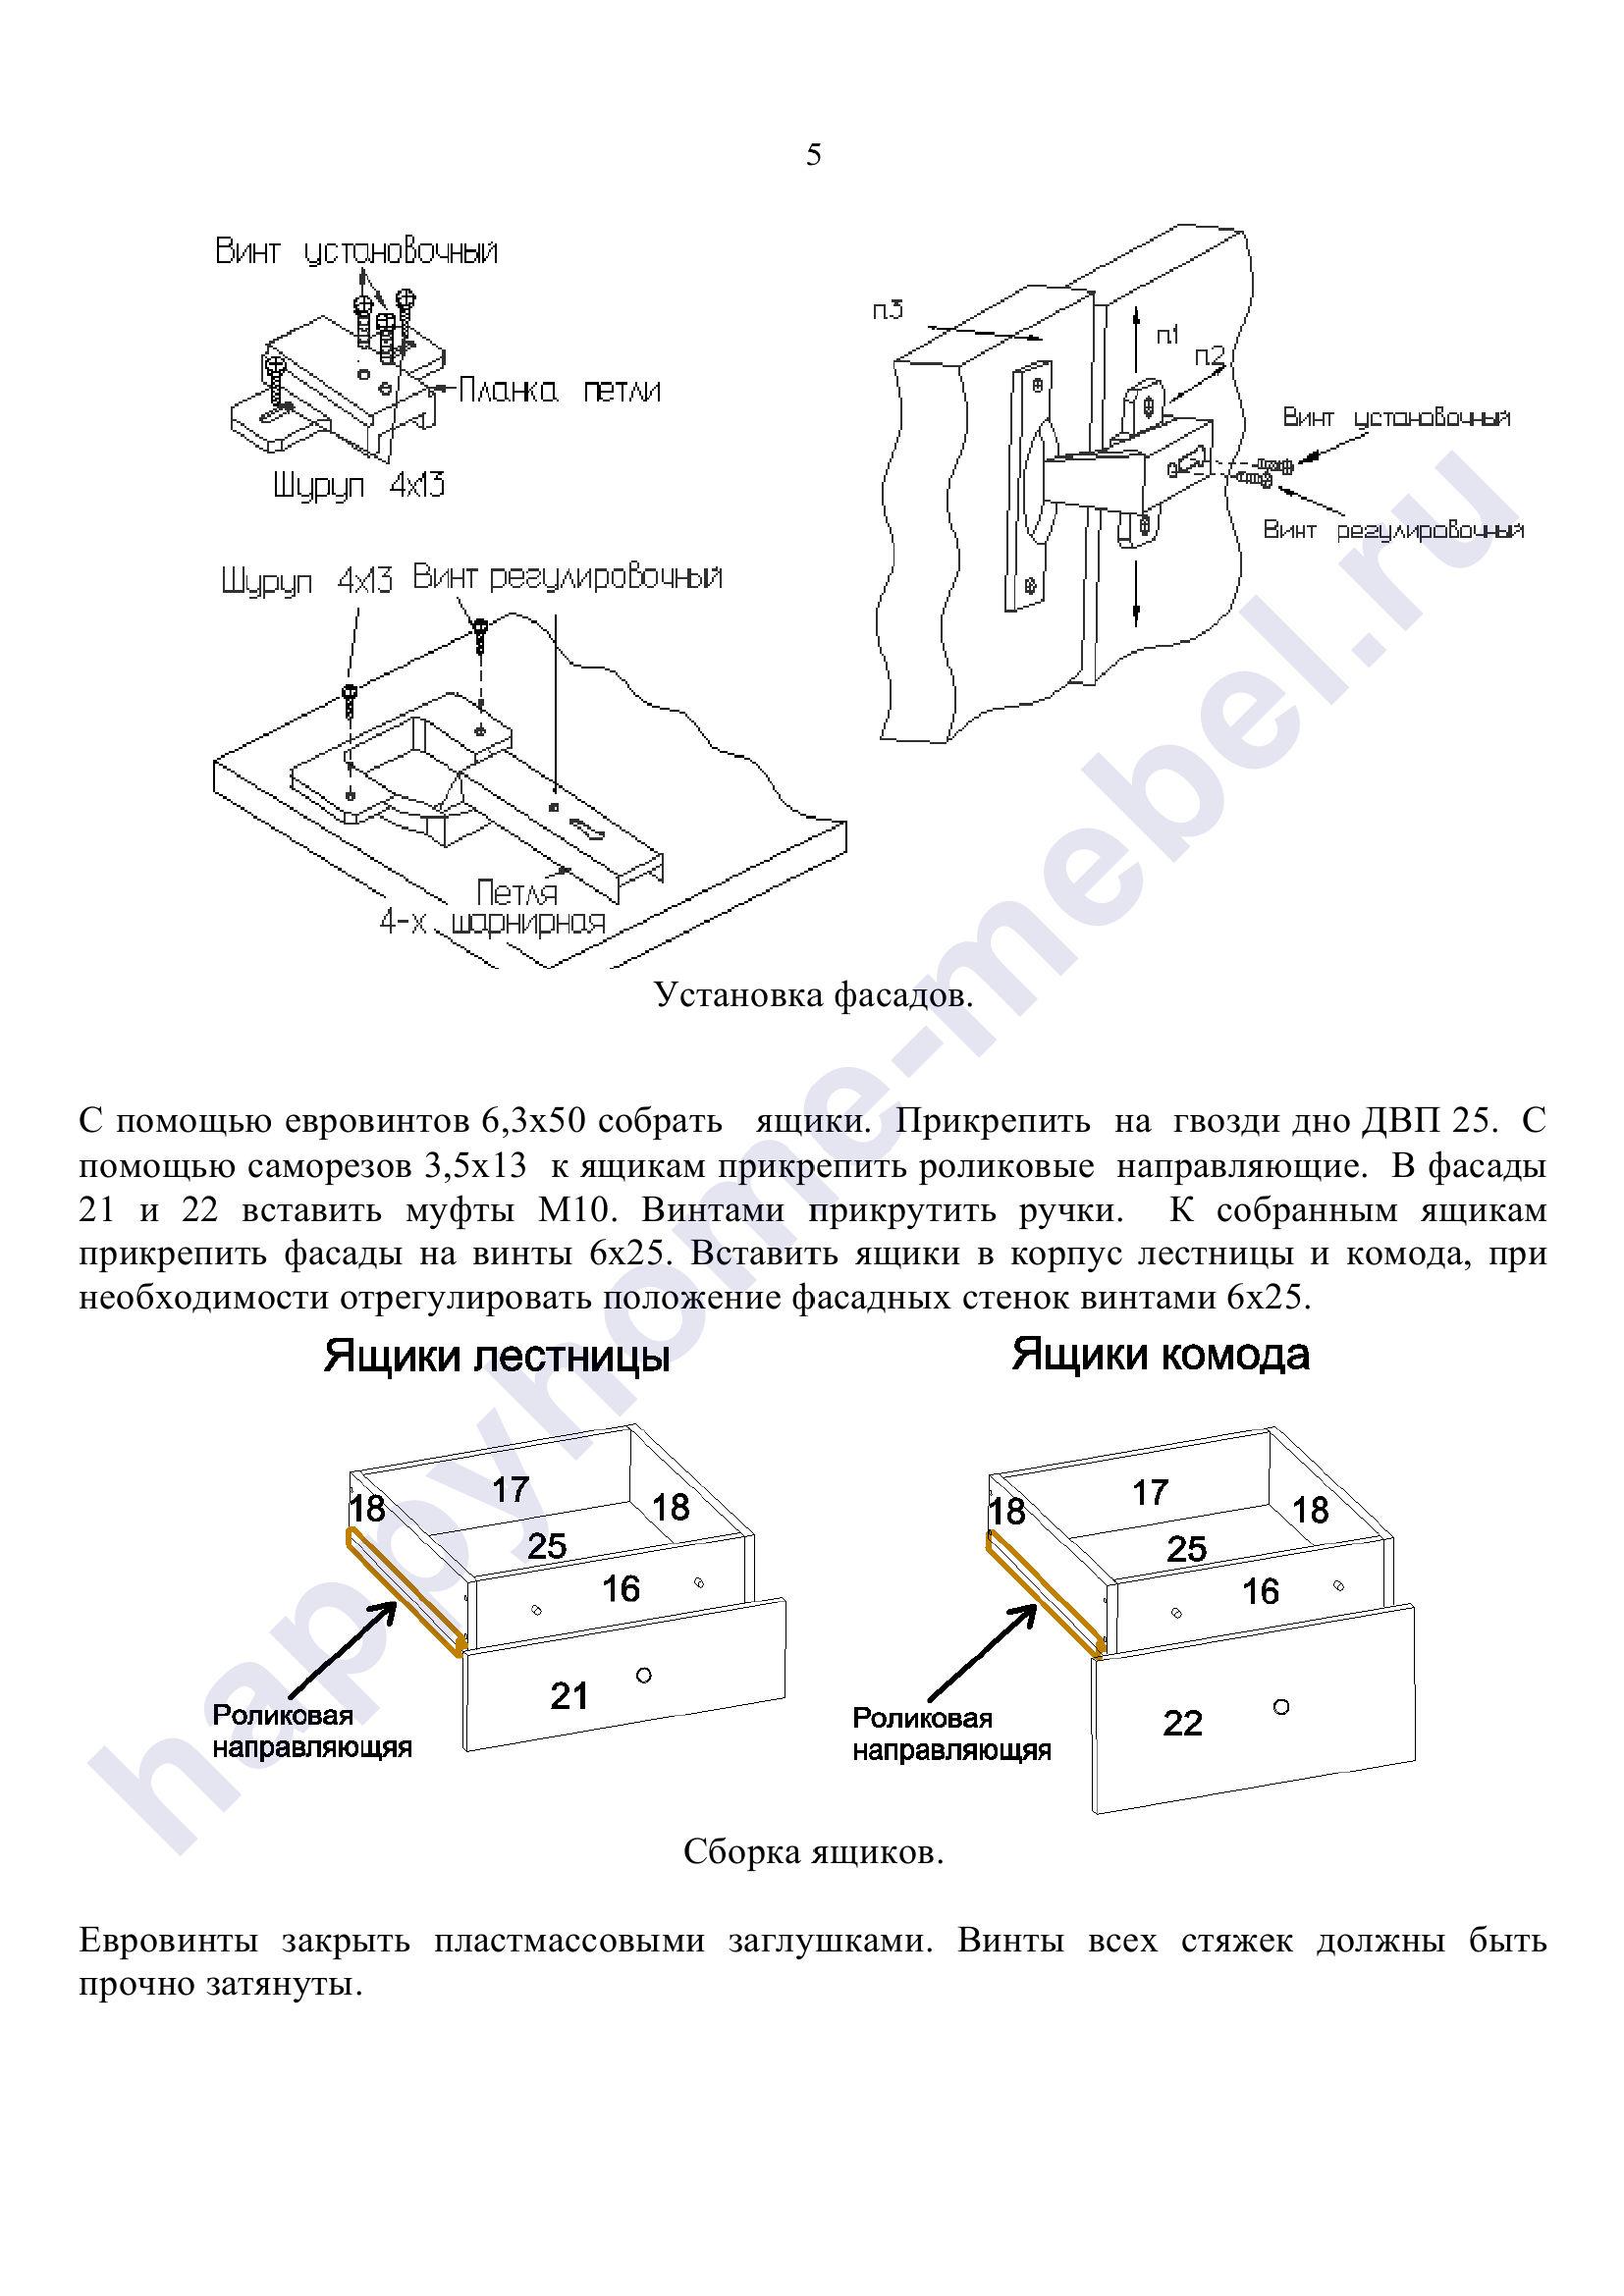 инструкция по сборке шкаф кровати